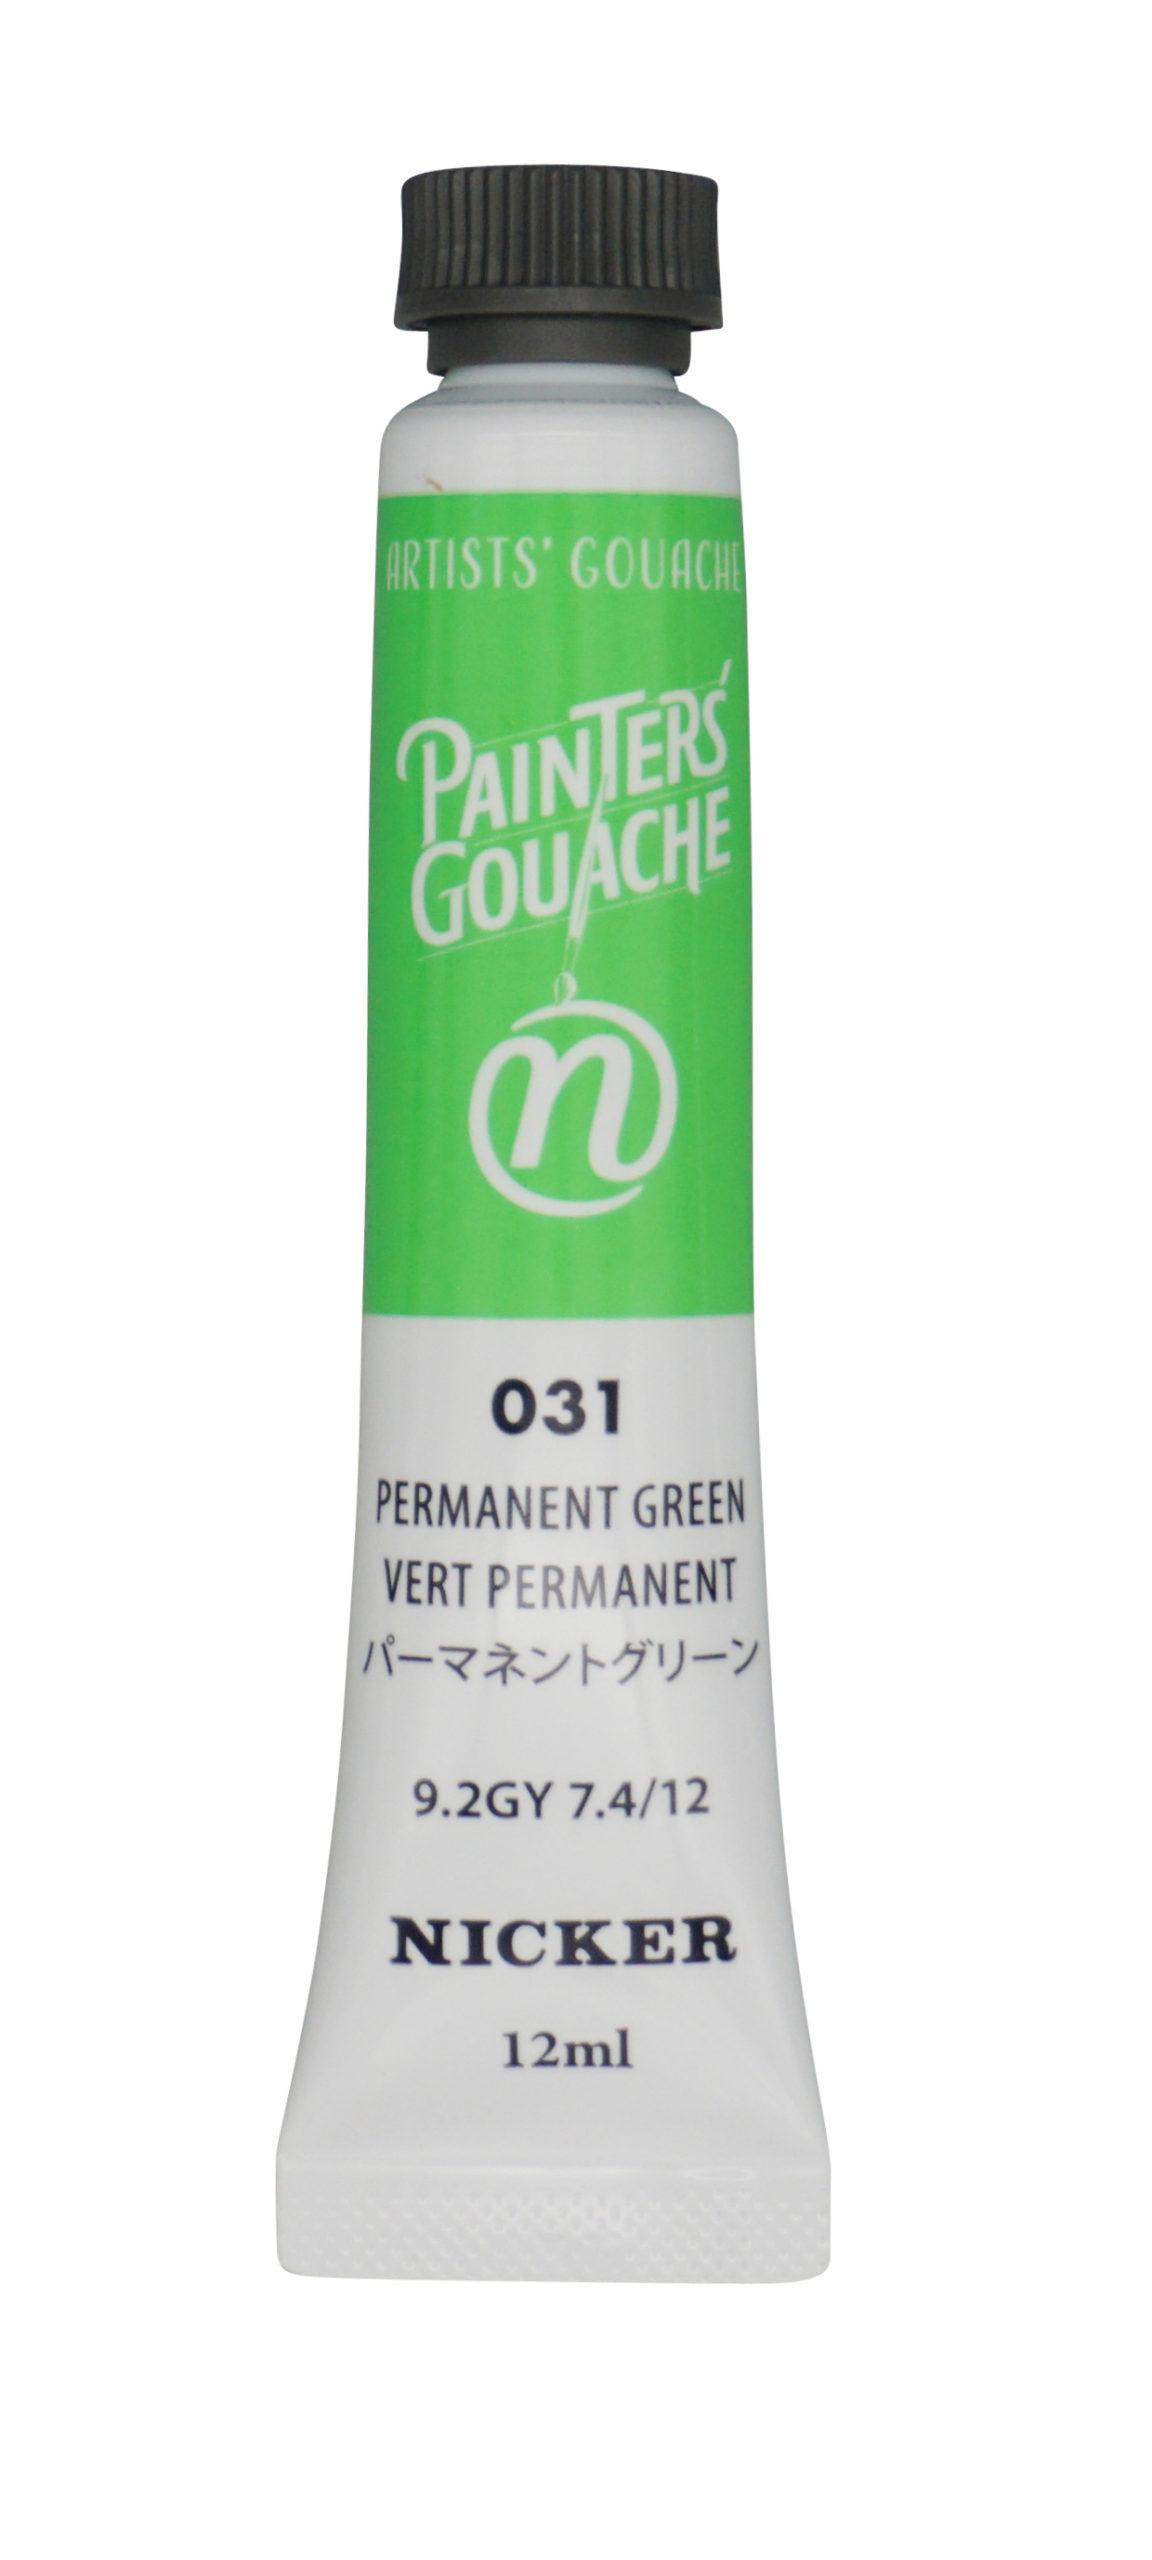 PAINTER'S GOUACHE PERMANENT GREEN